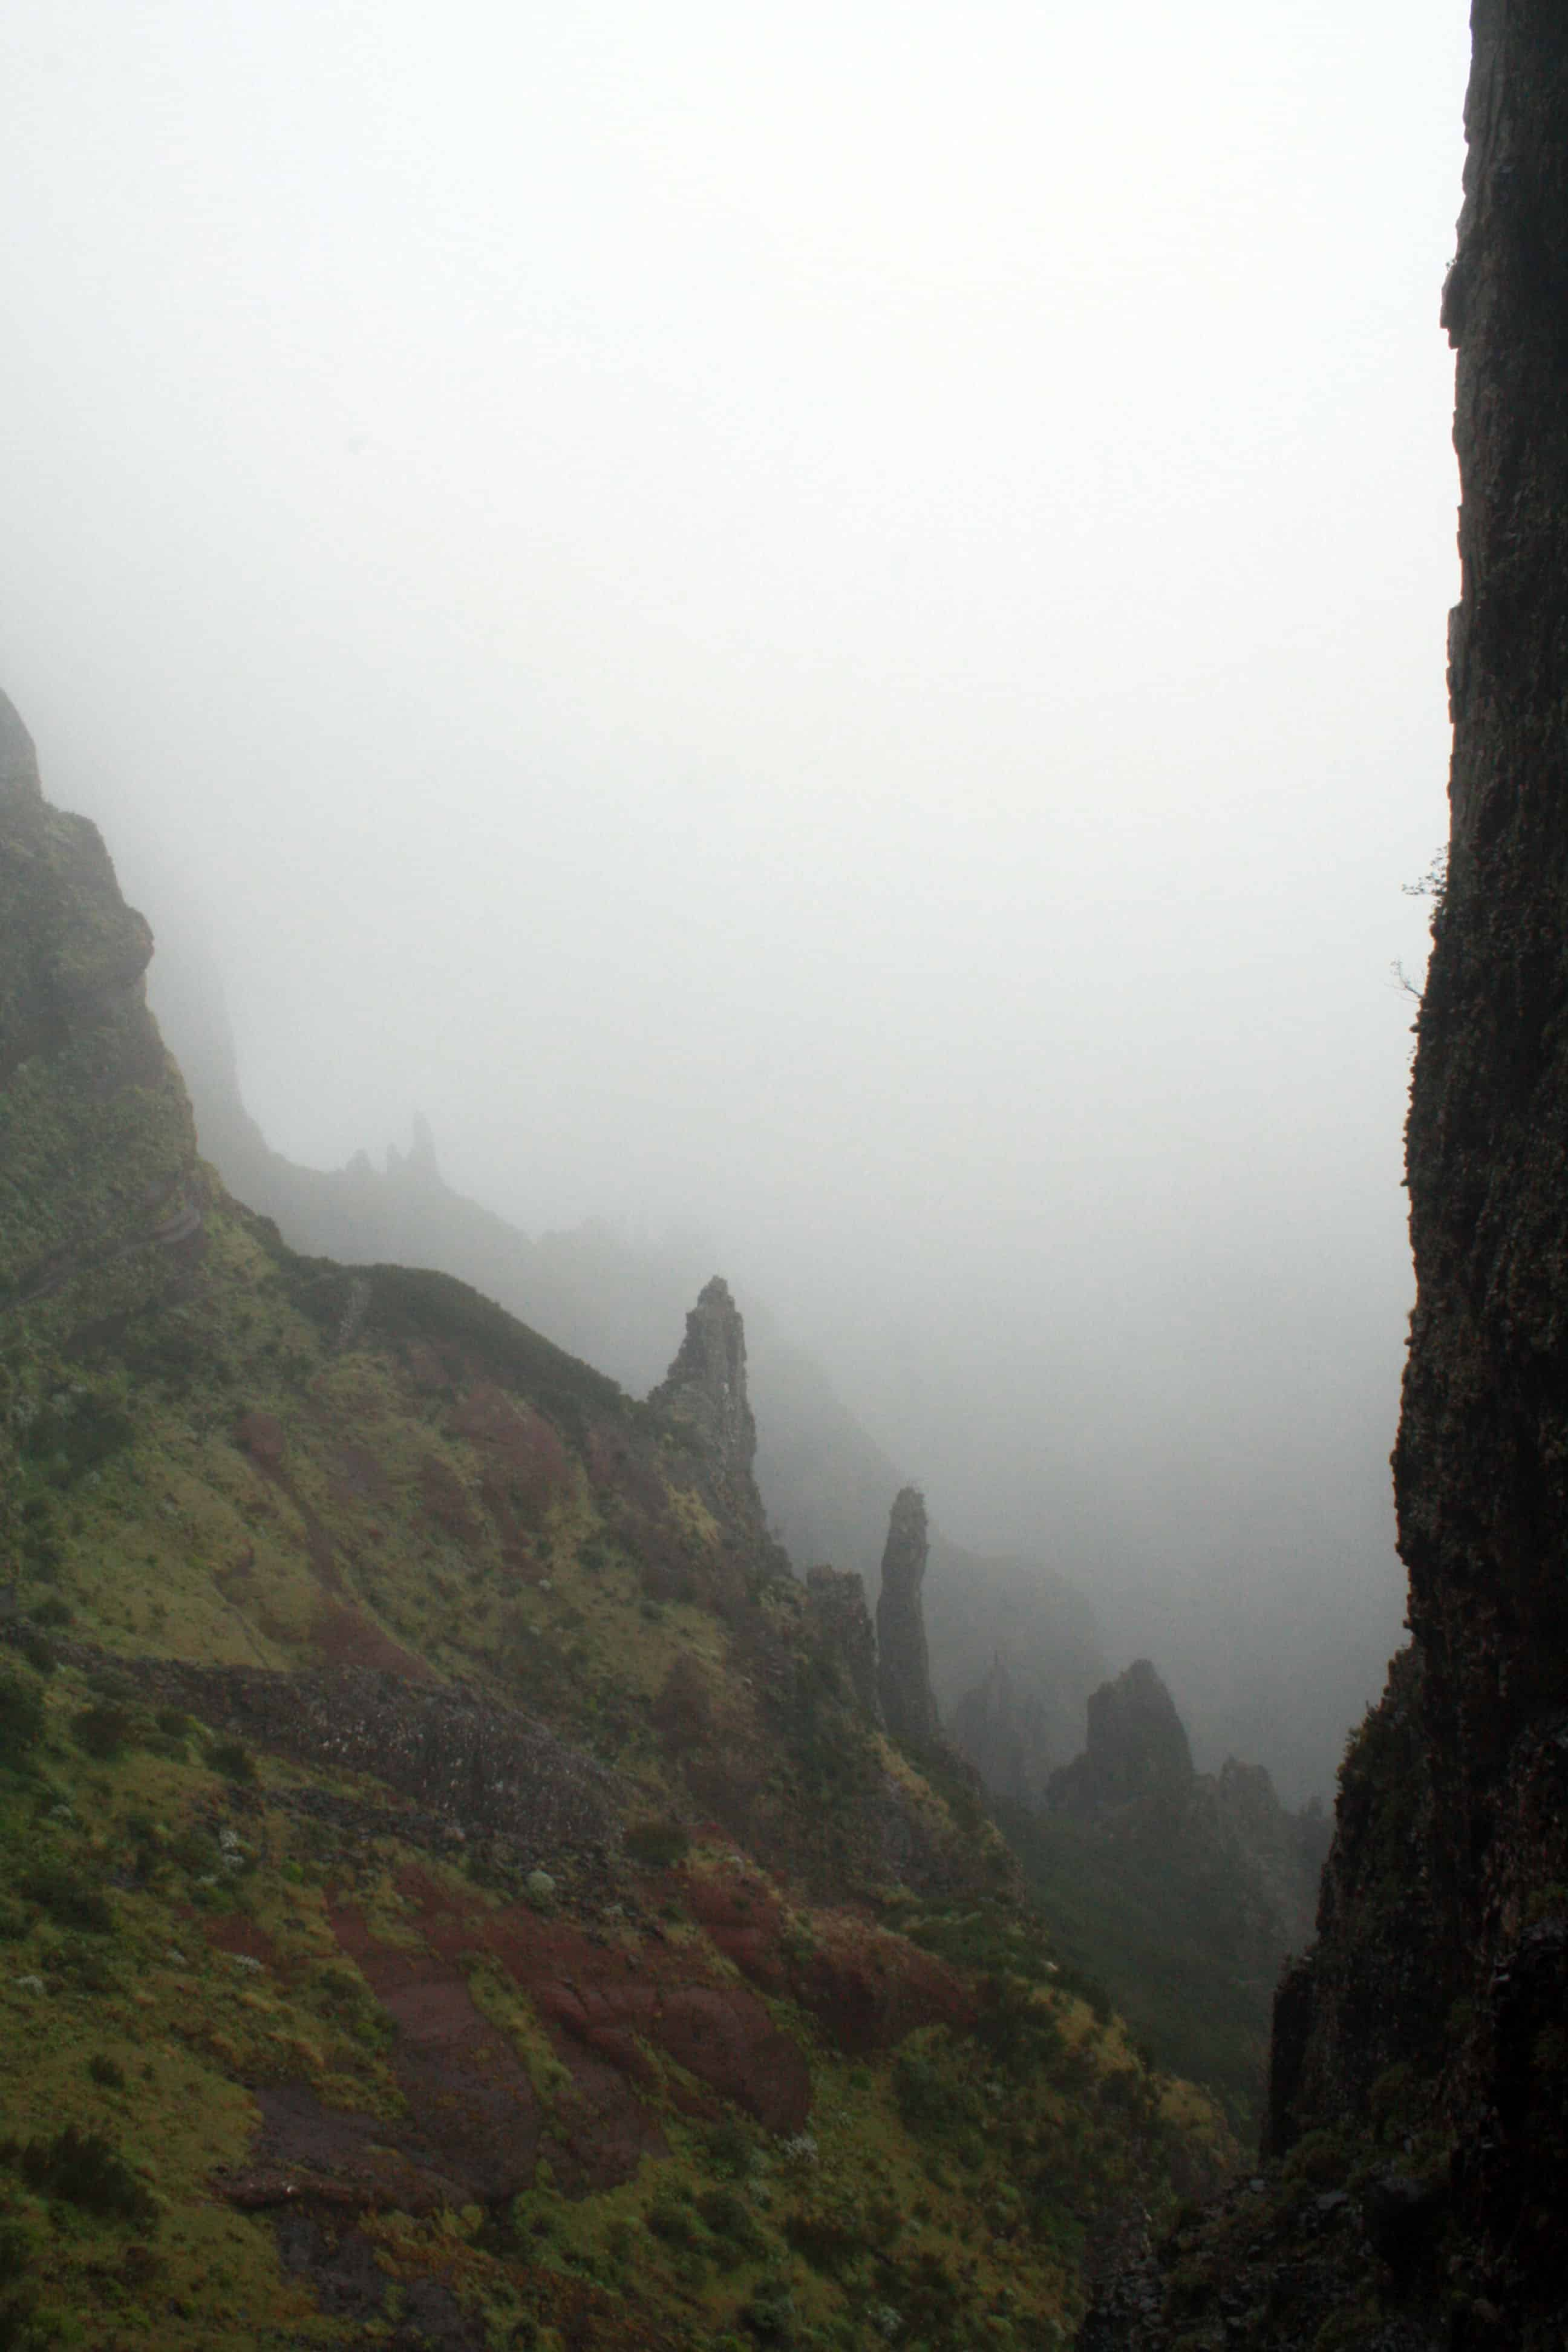 Walking Pico do Arieiro to Pico Ruivo